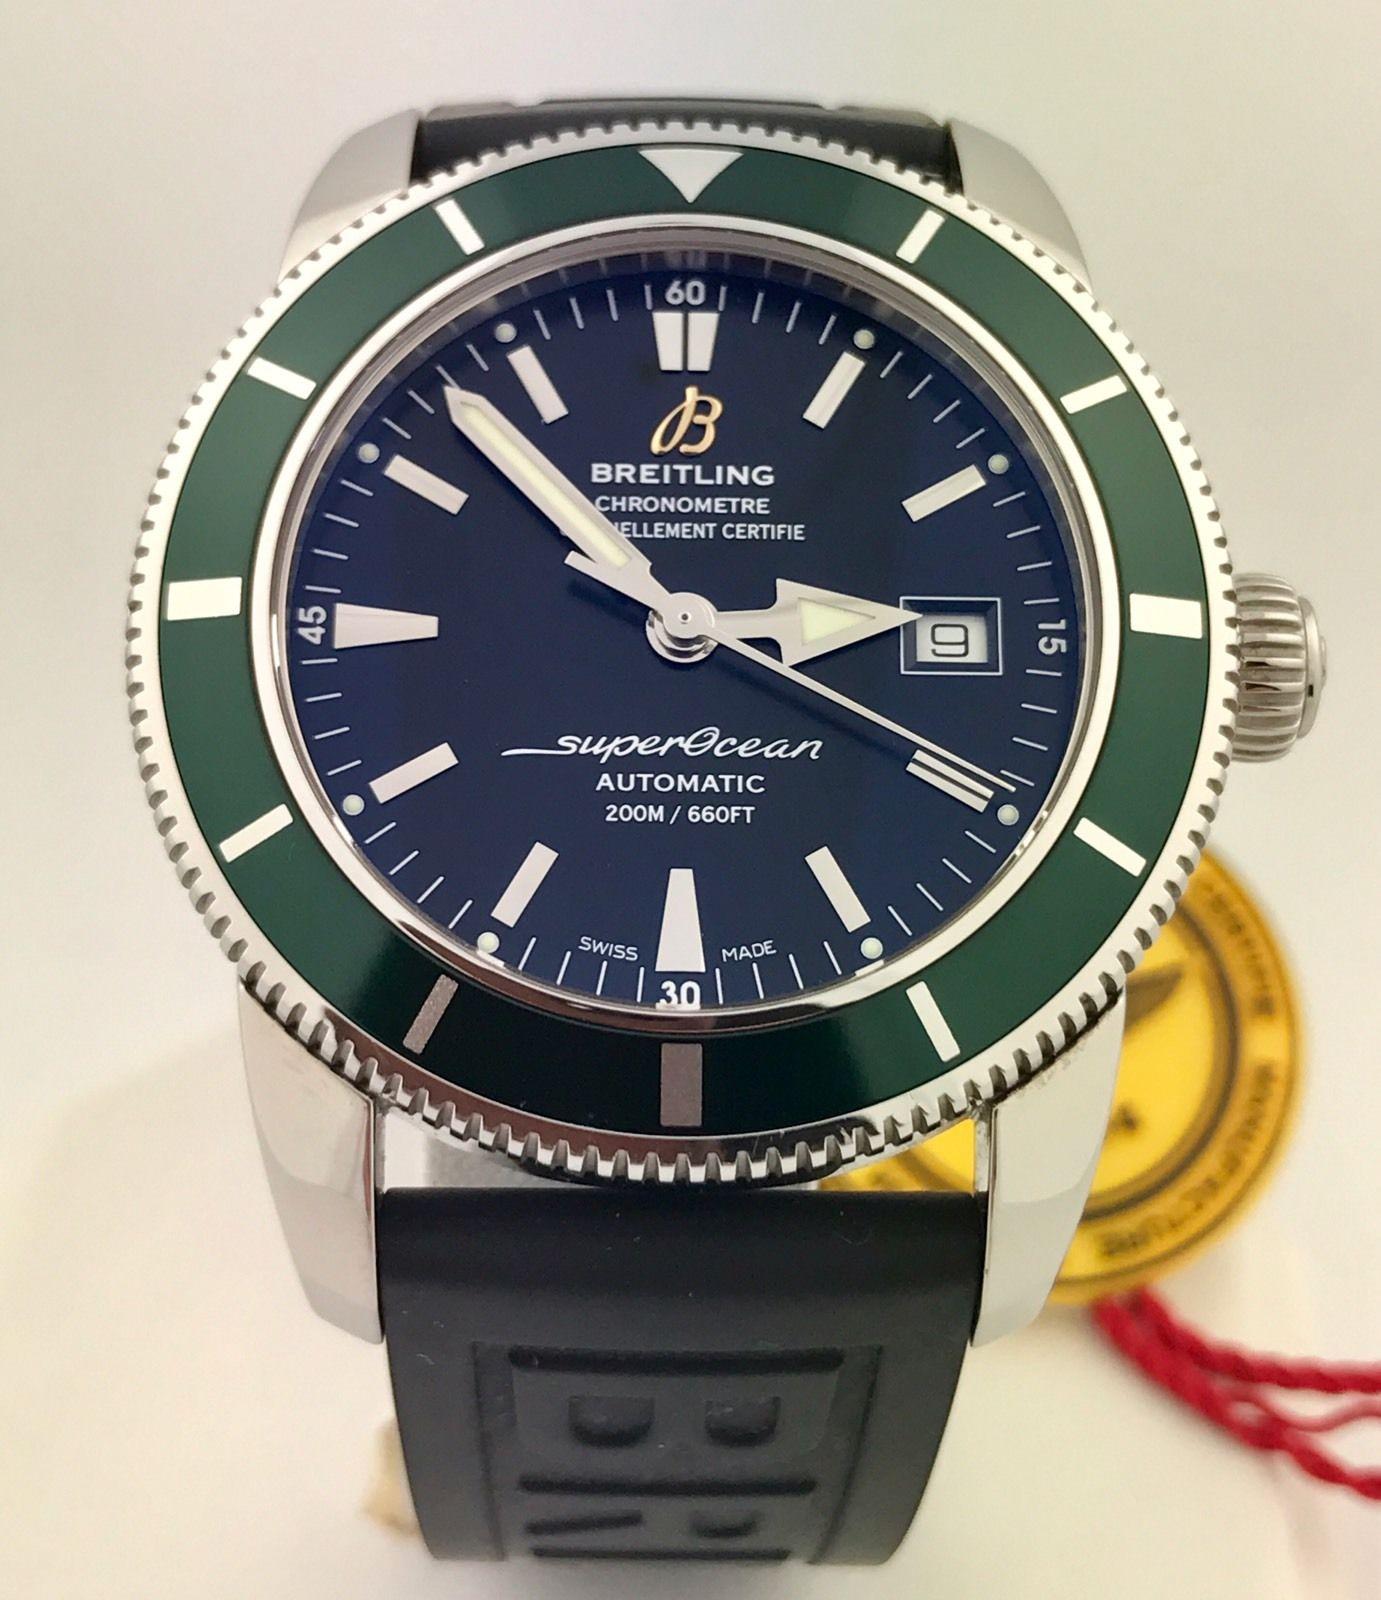 s l1600 1 3 - Breitling SuperOcean Heritage